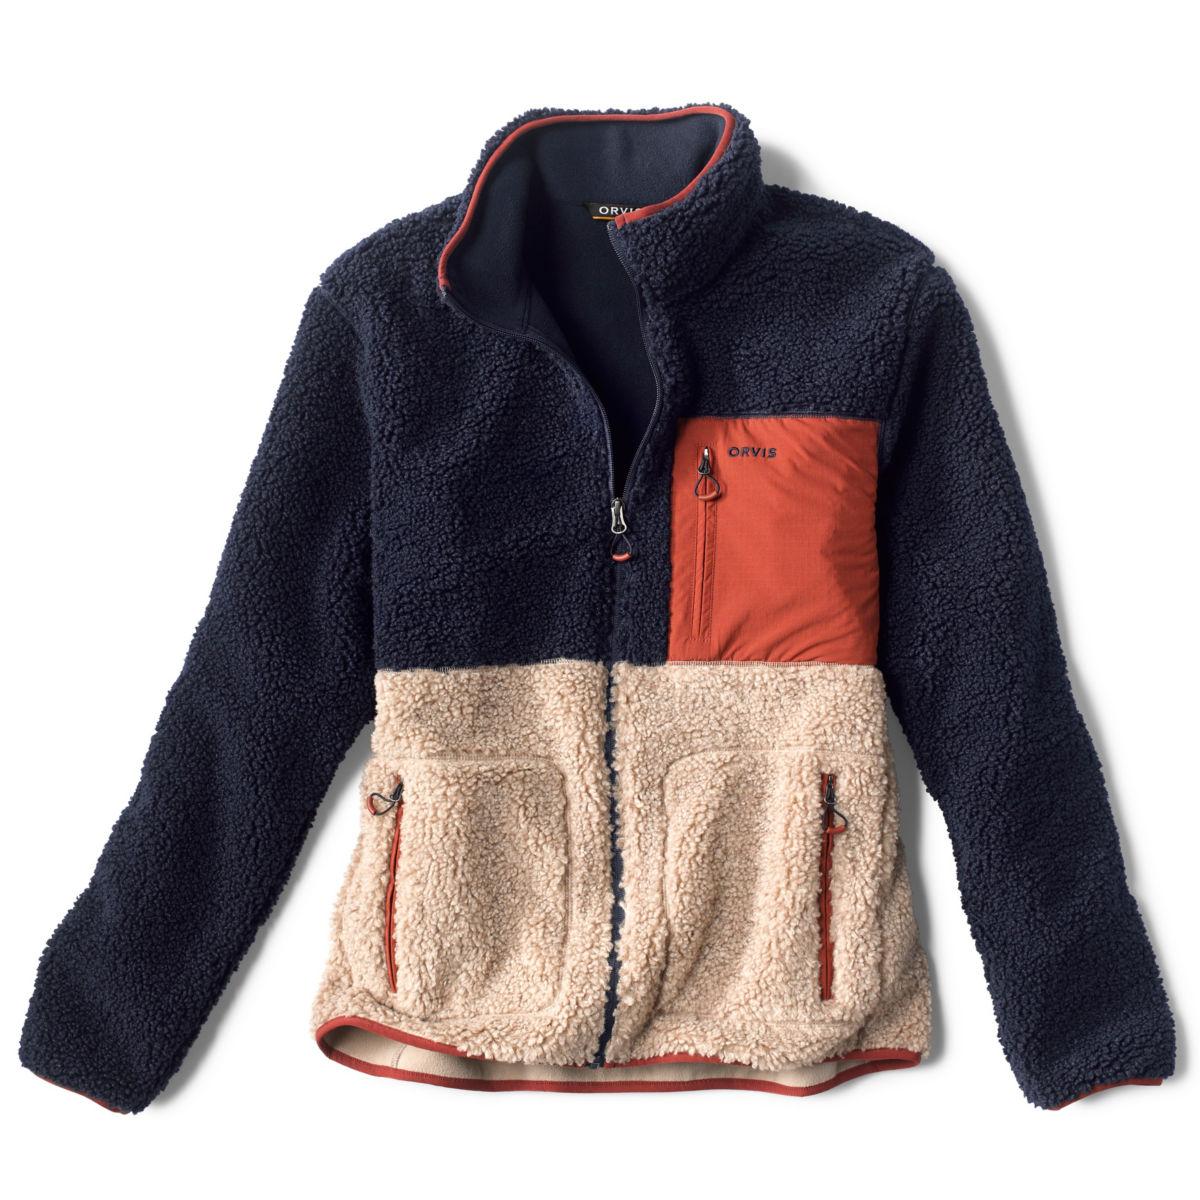 Colorblock Sherpa Jacket - NAVY/NATURALimage number 0